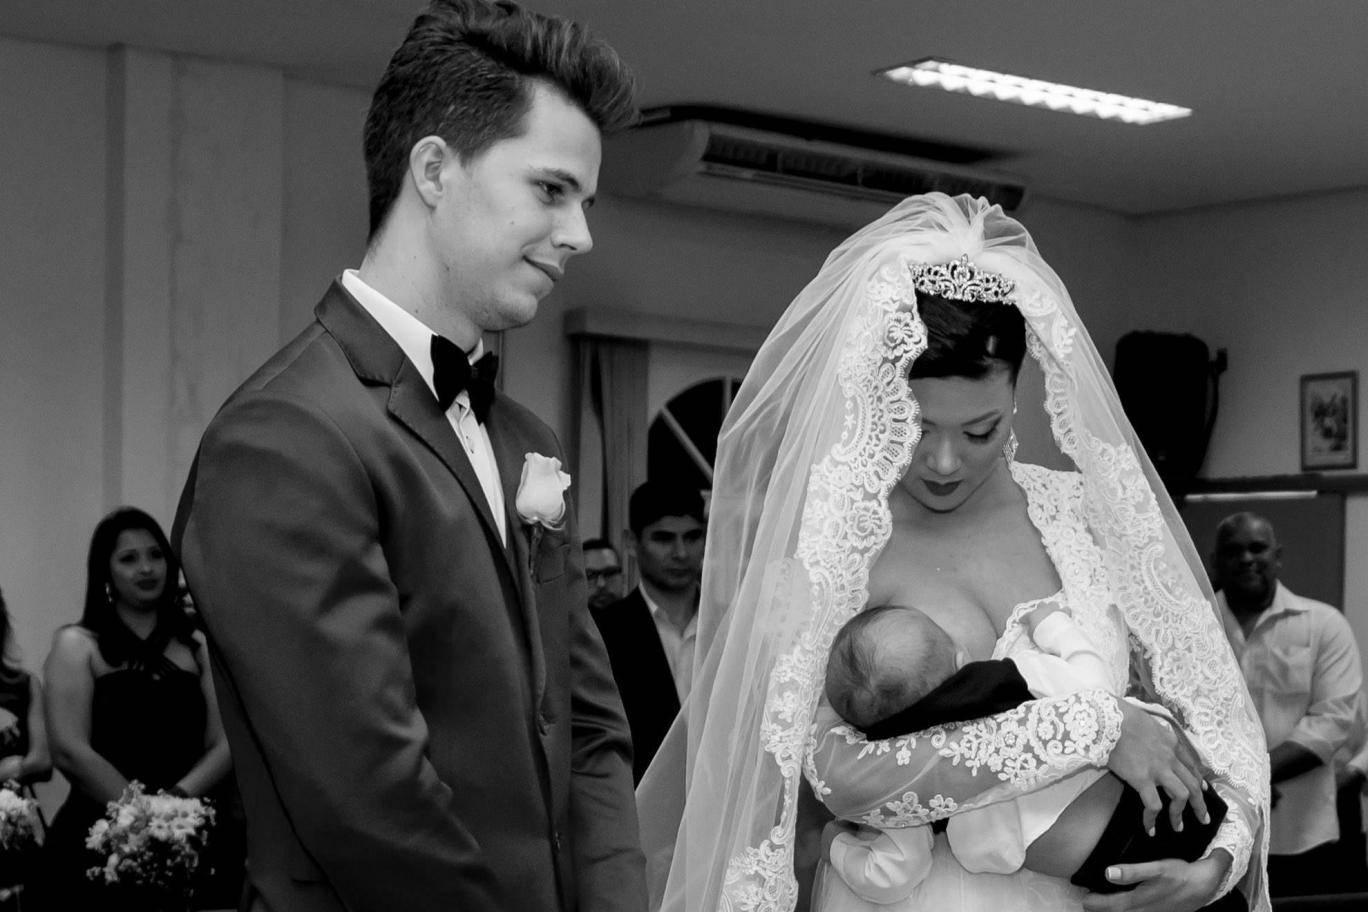 Bride Applauded For Breastfeeding Her Baby During Wedding